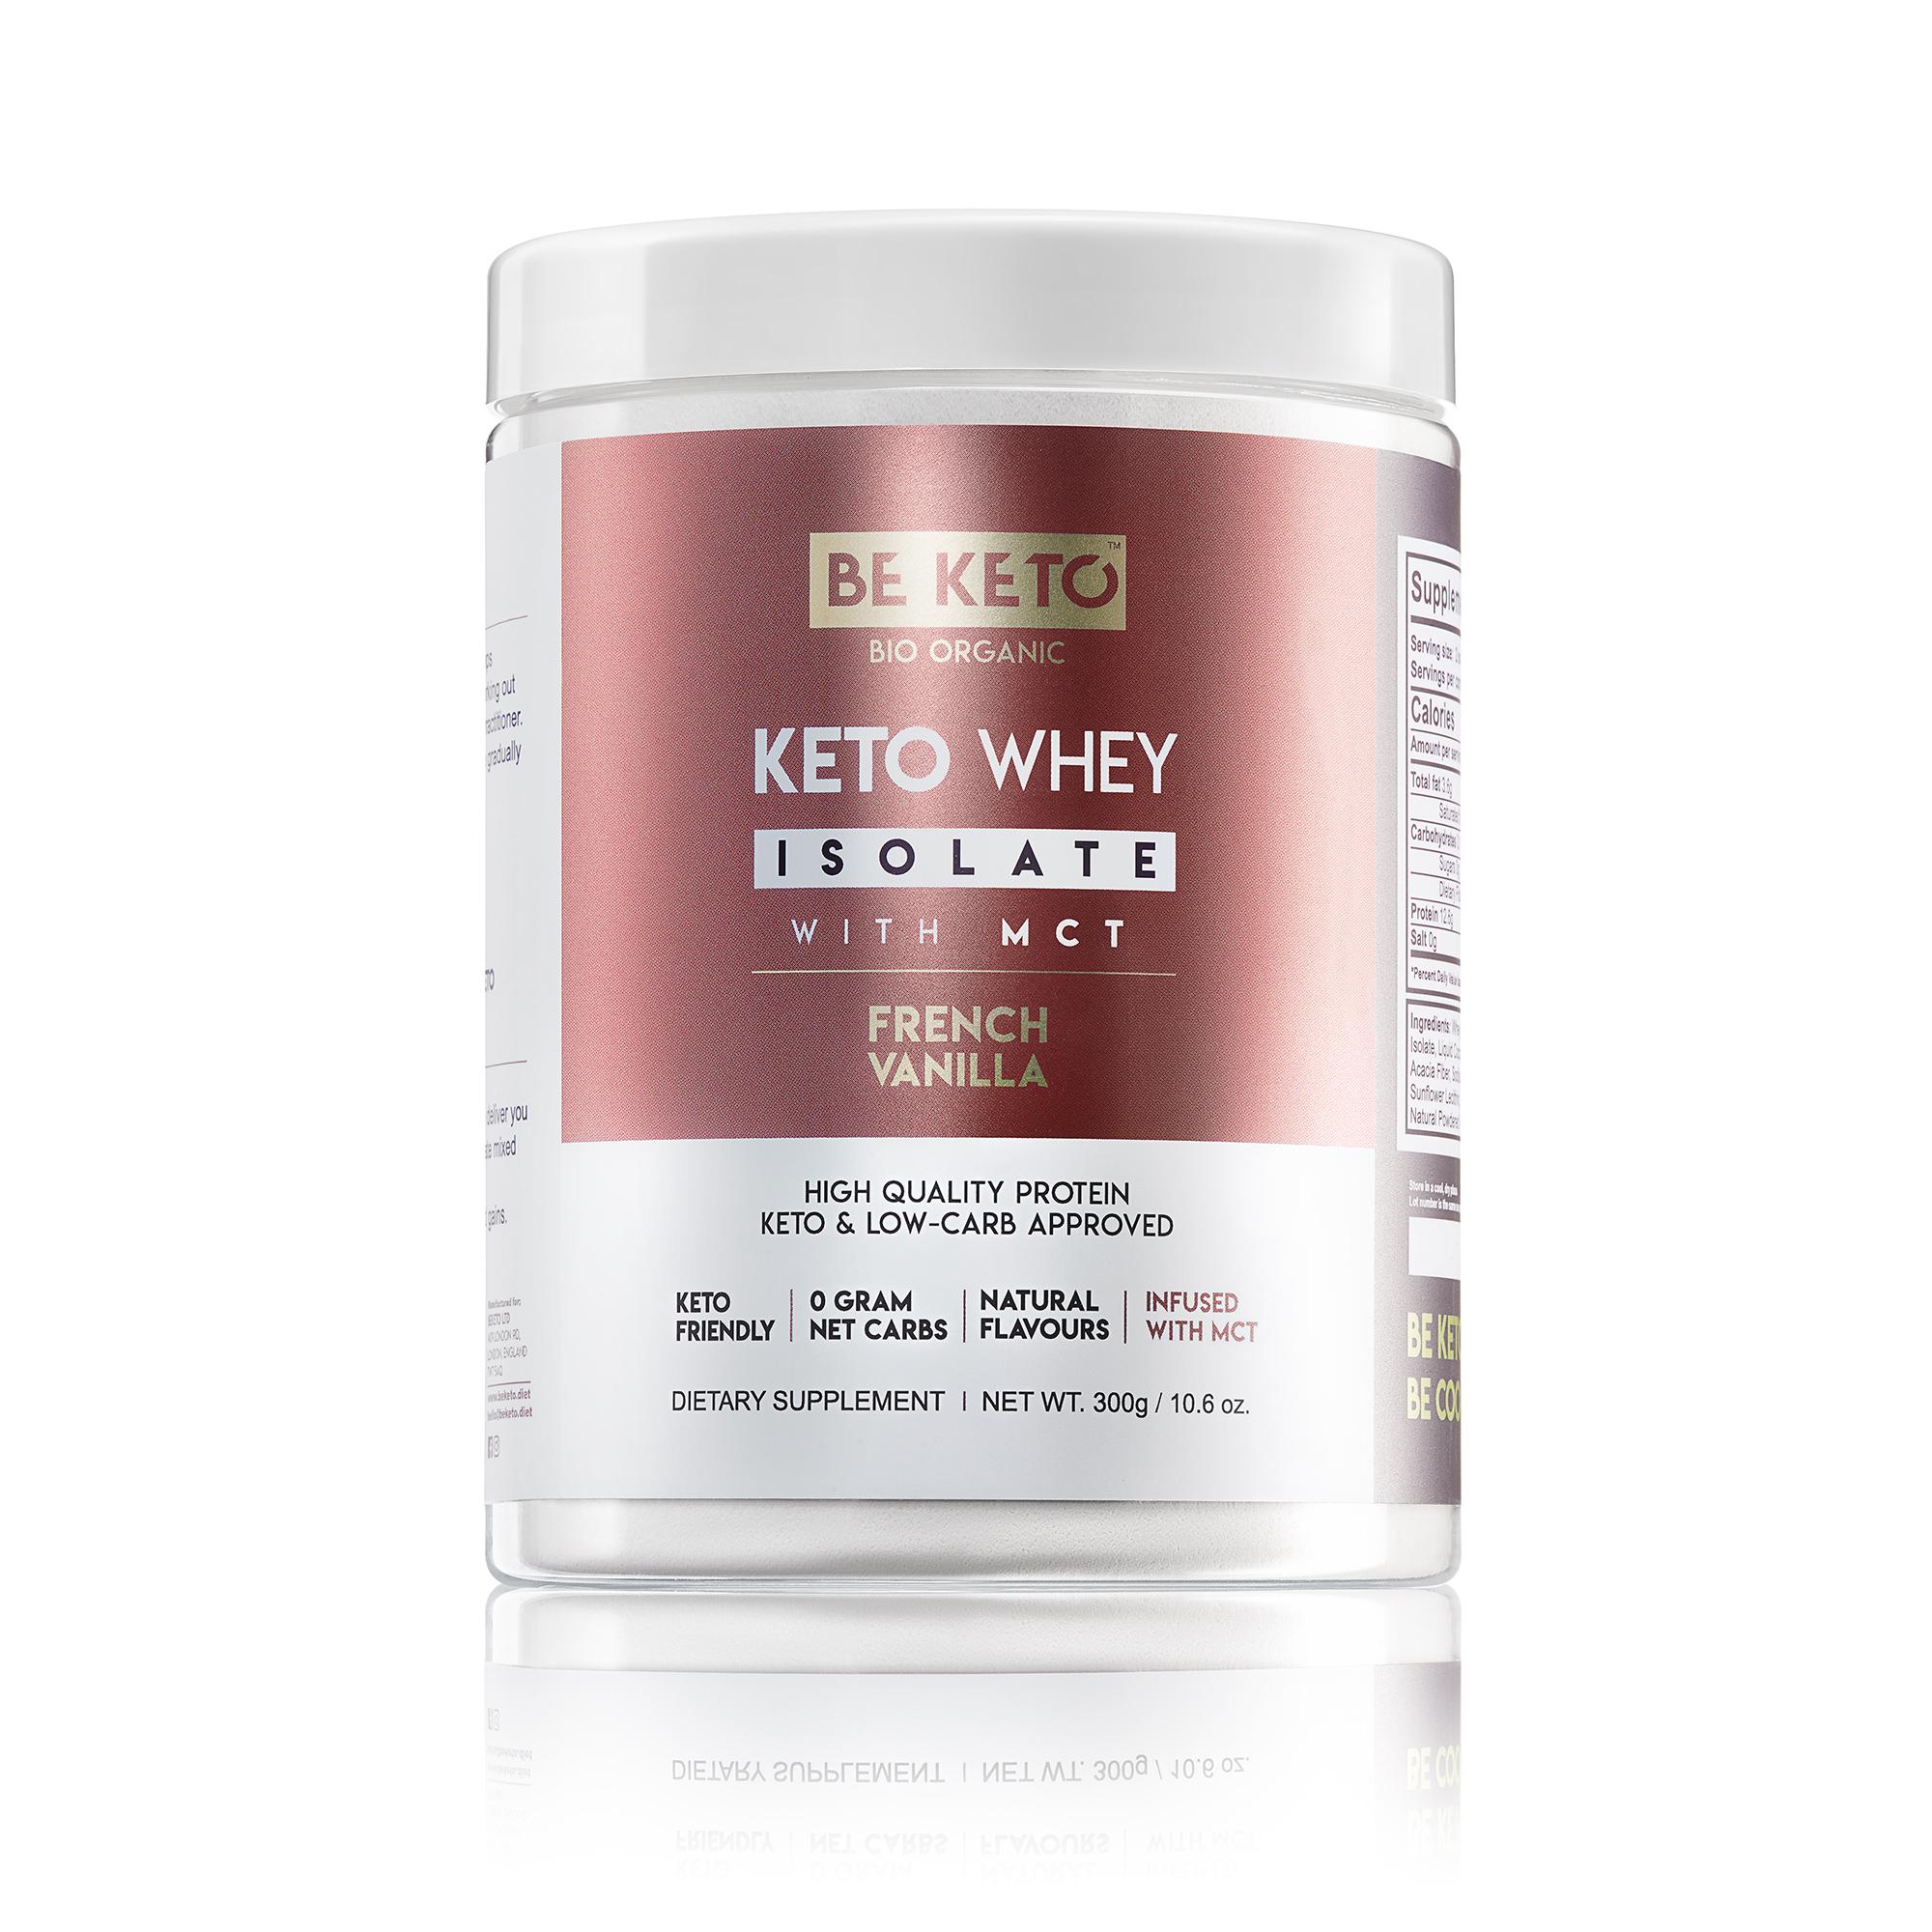 Keto Whey isolate + MCT - French Vanilla 300G